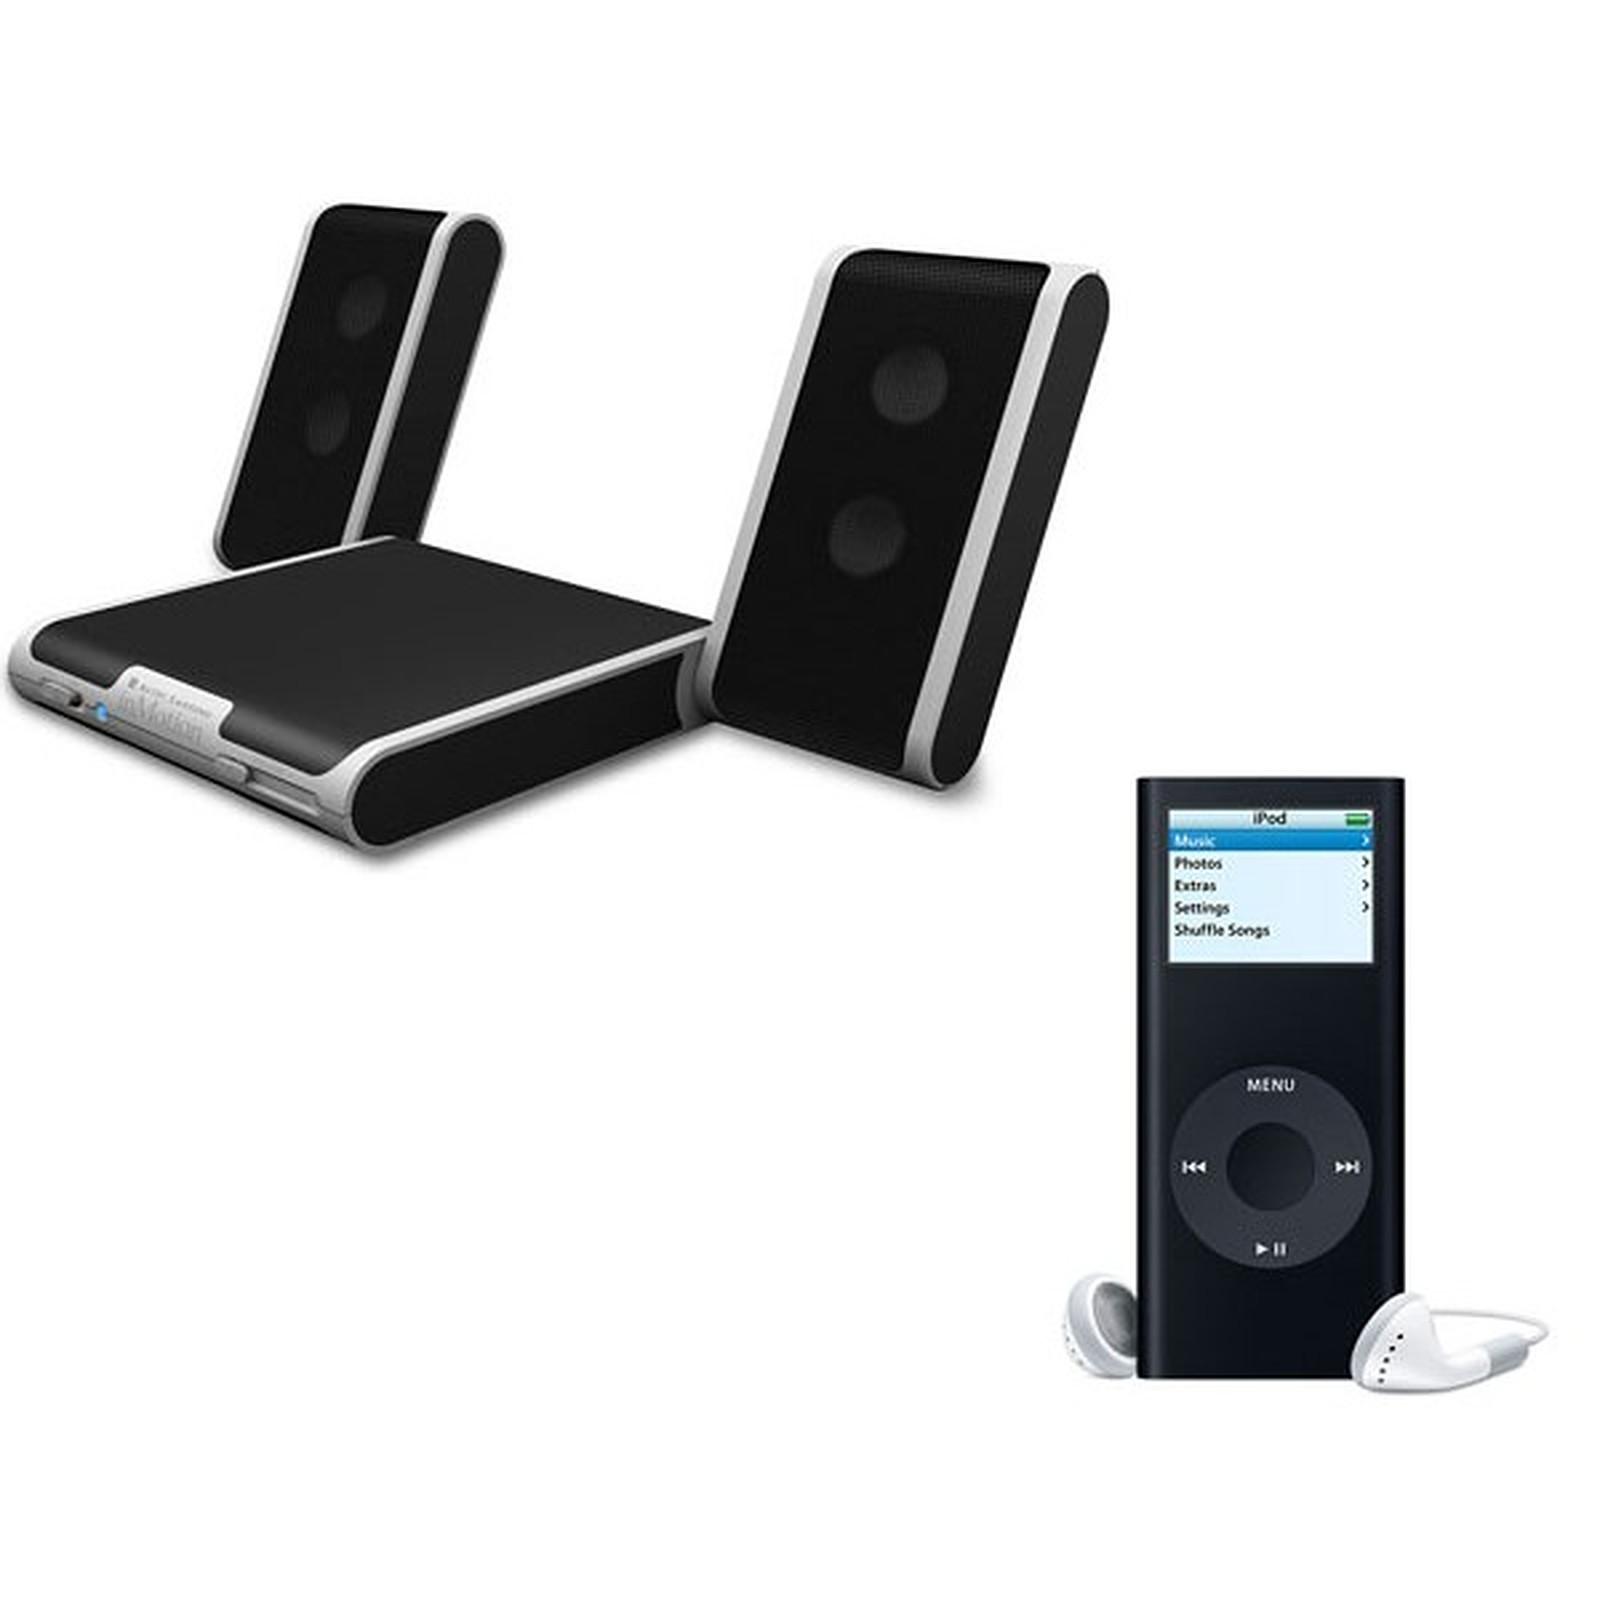 Apple iPod nano 8 Go (coloris noir) + Altec Lansing inMotion iM4